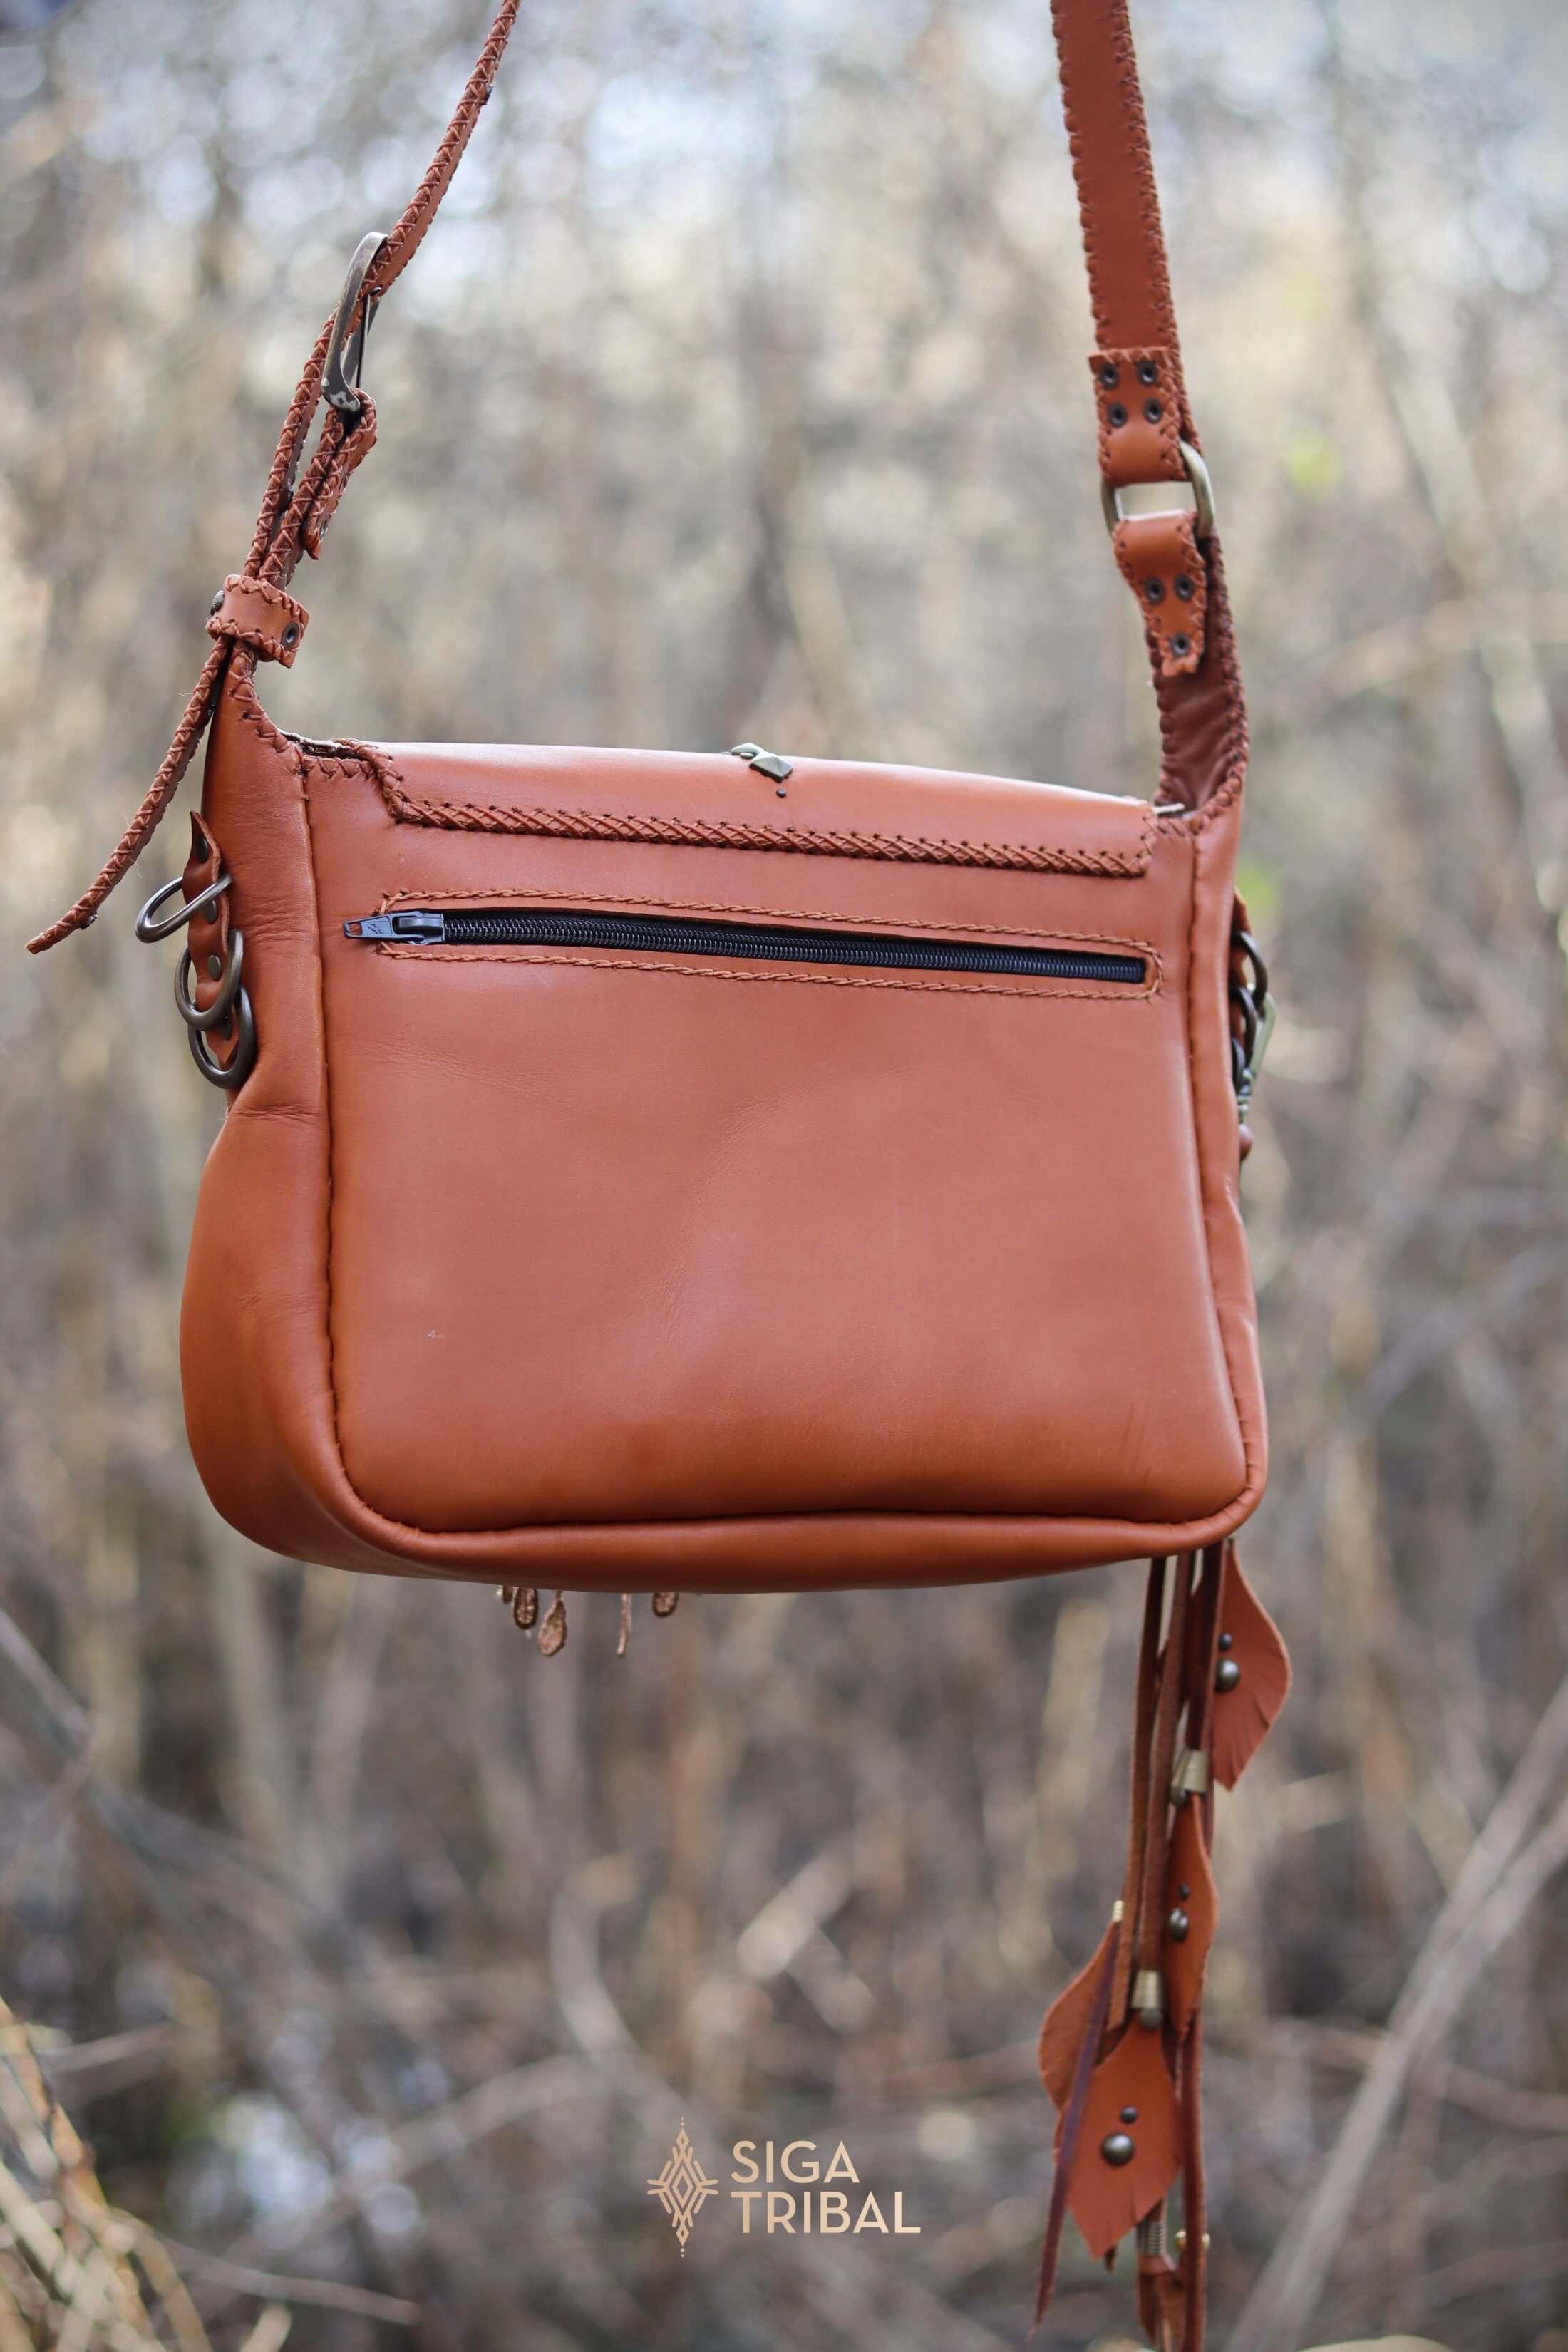 Spring Bag by Siga Tribal